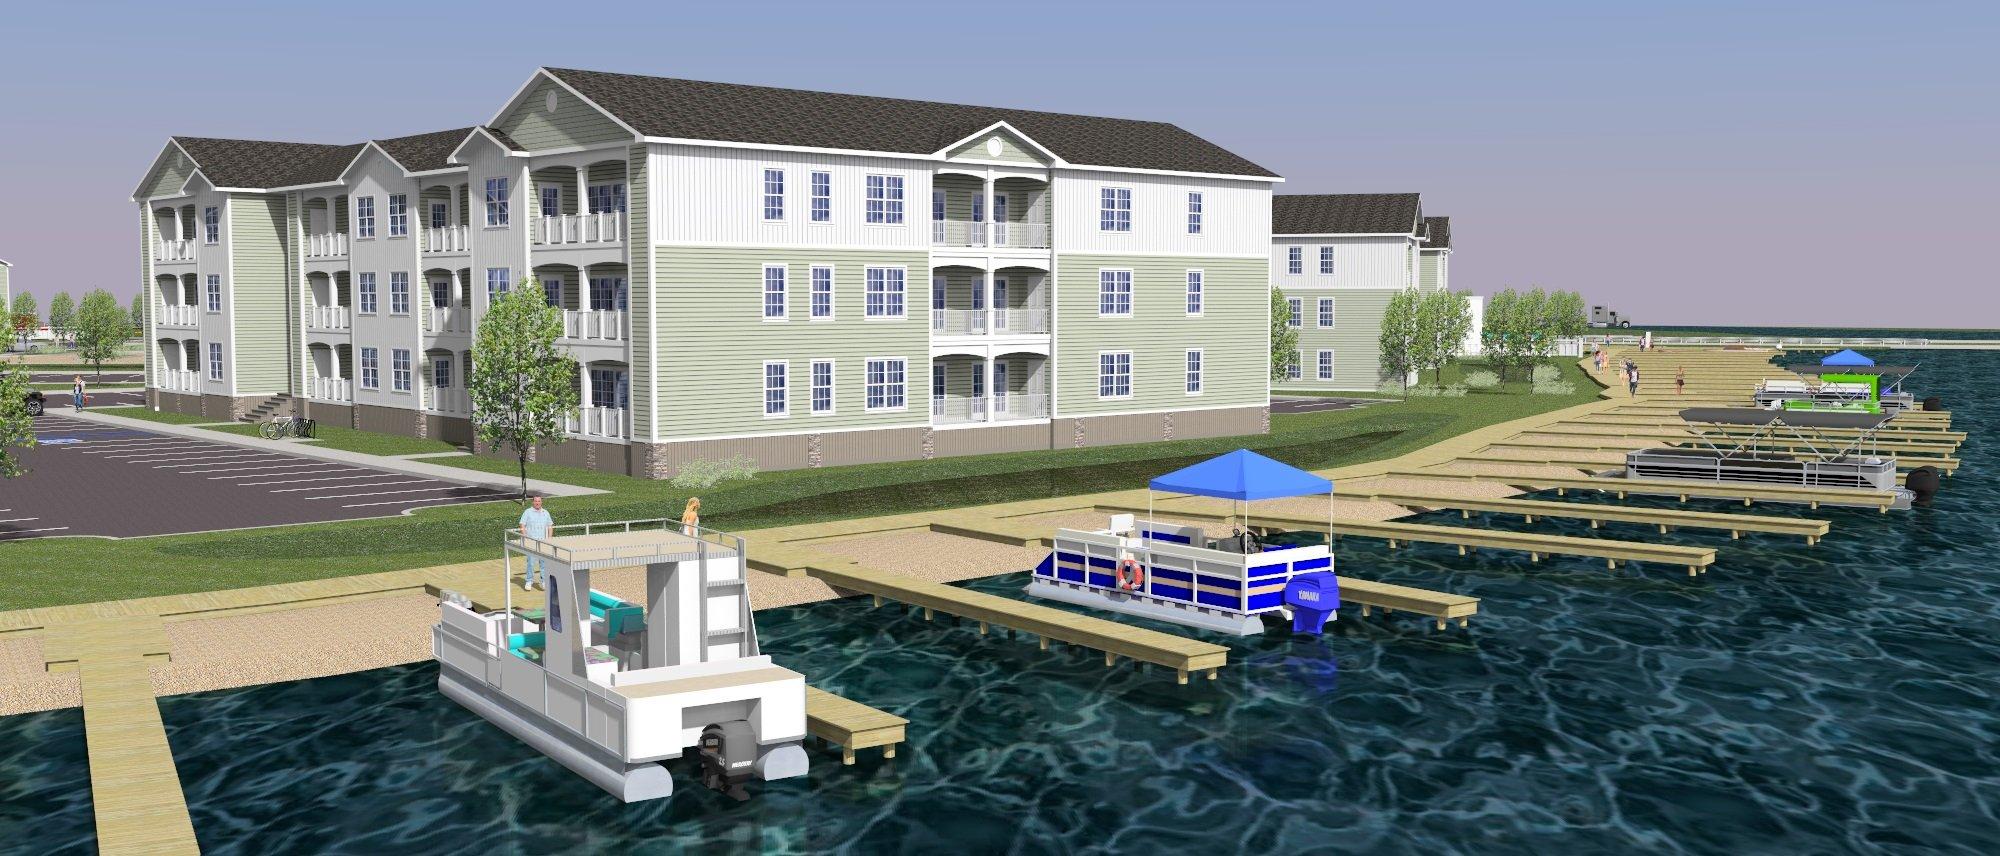 Rehoboth Residences Marina - Rendering